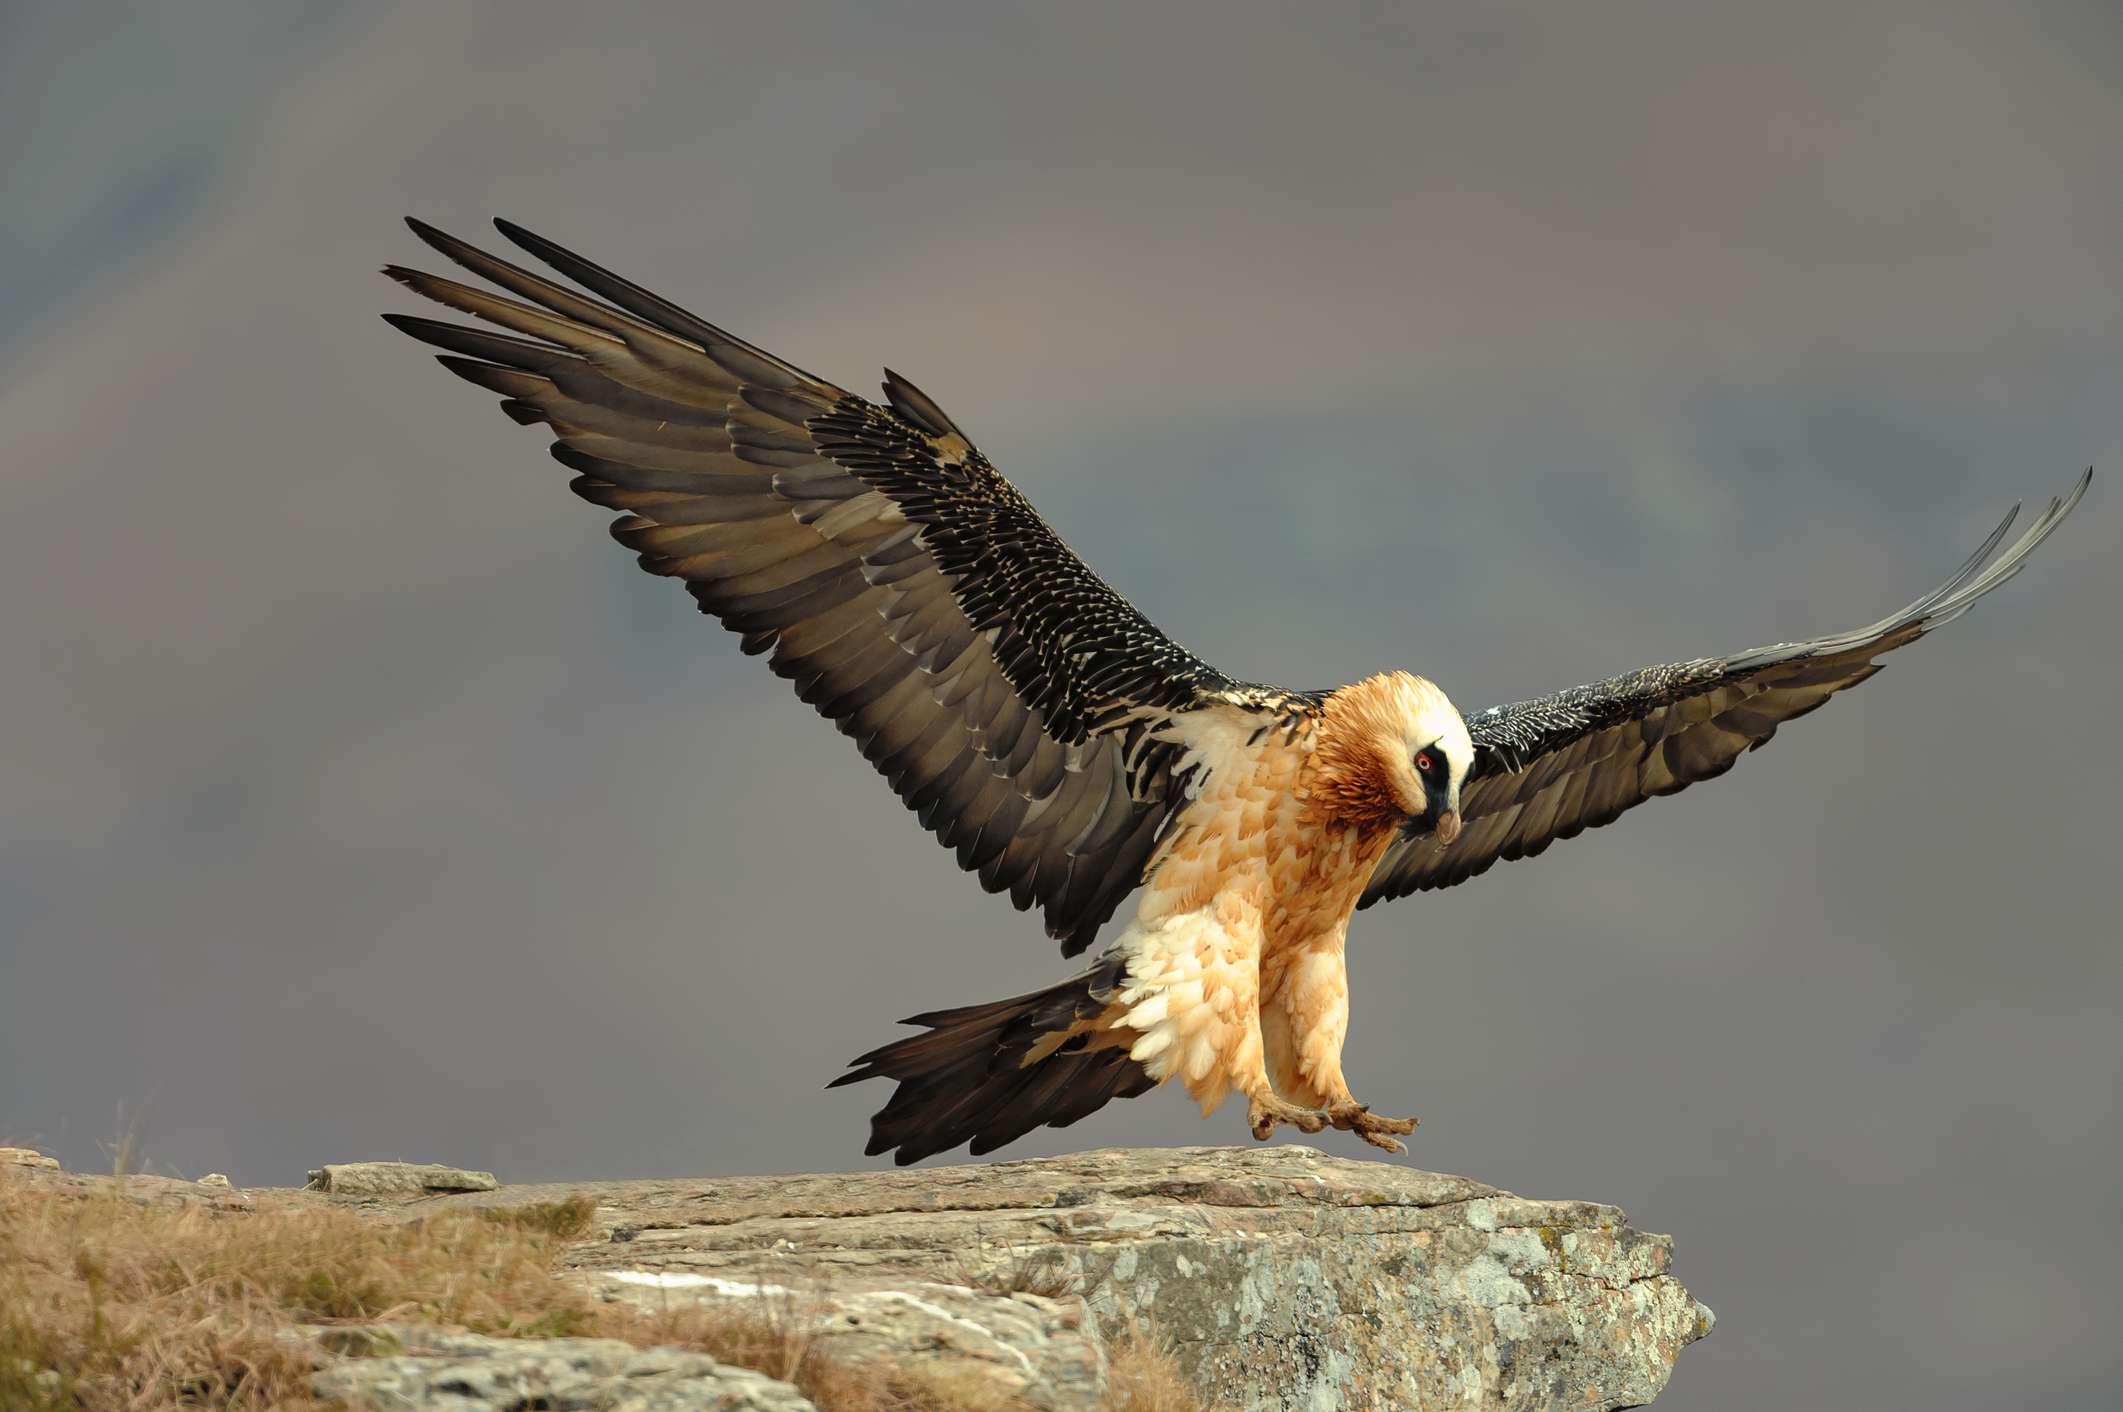 Bearded vulture or lammergeier, South Africa